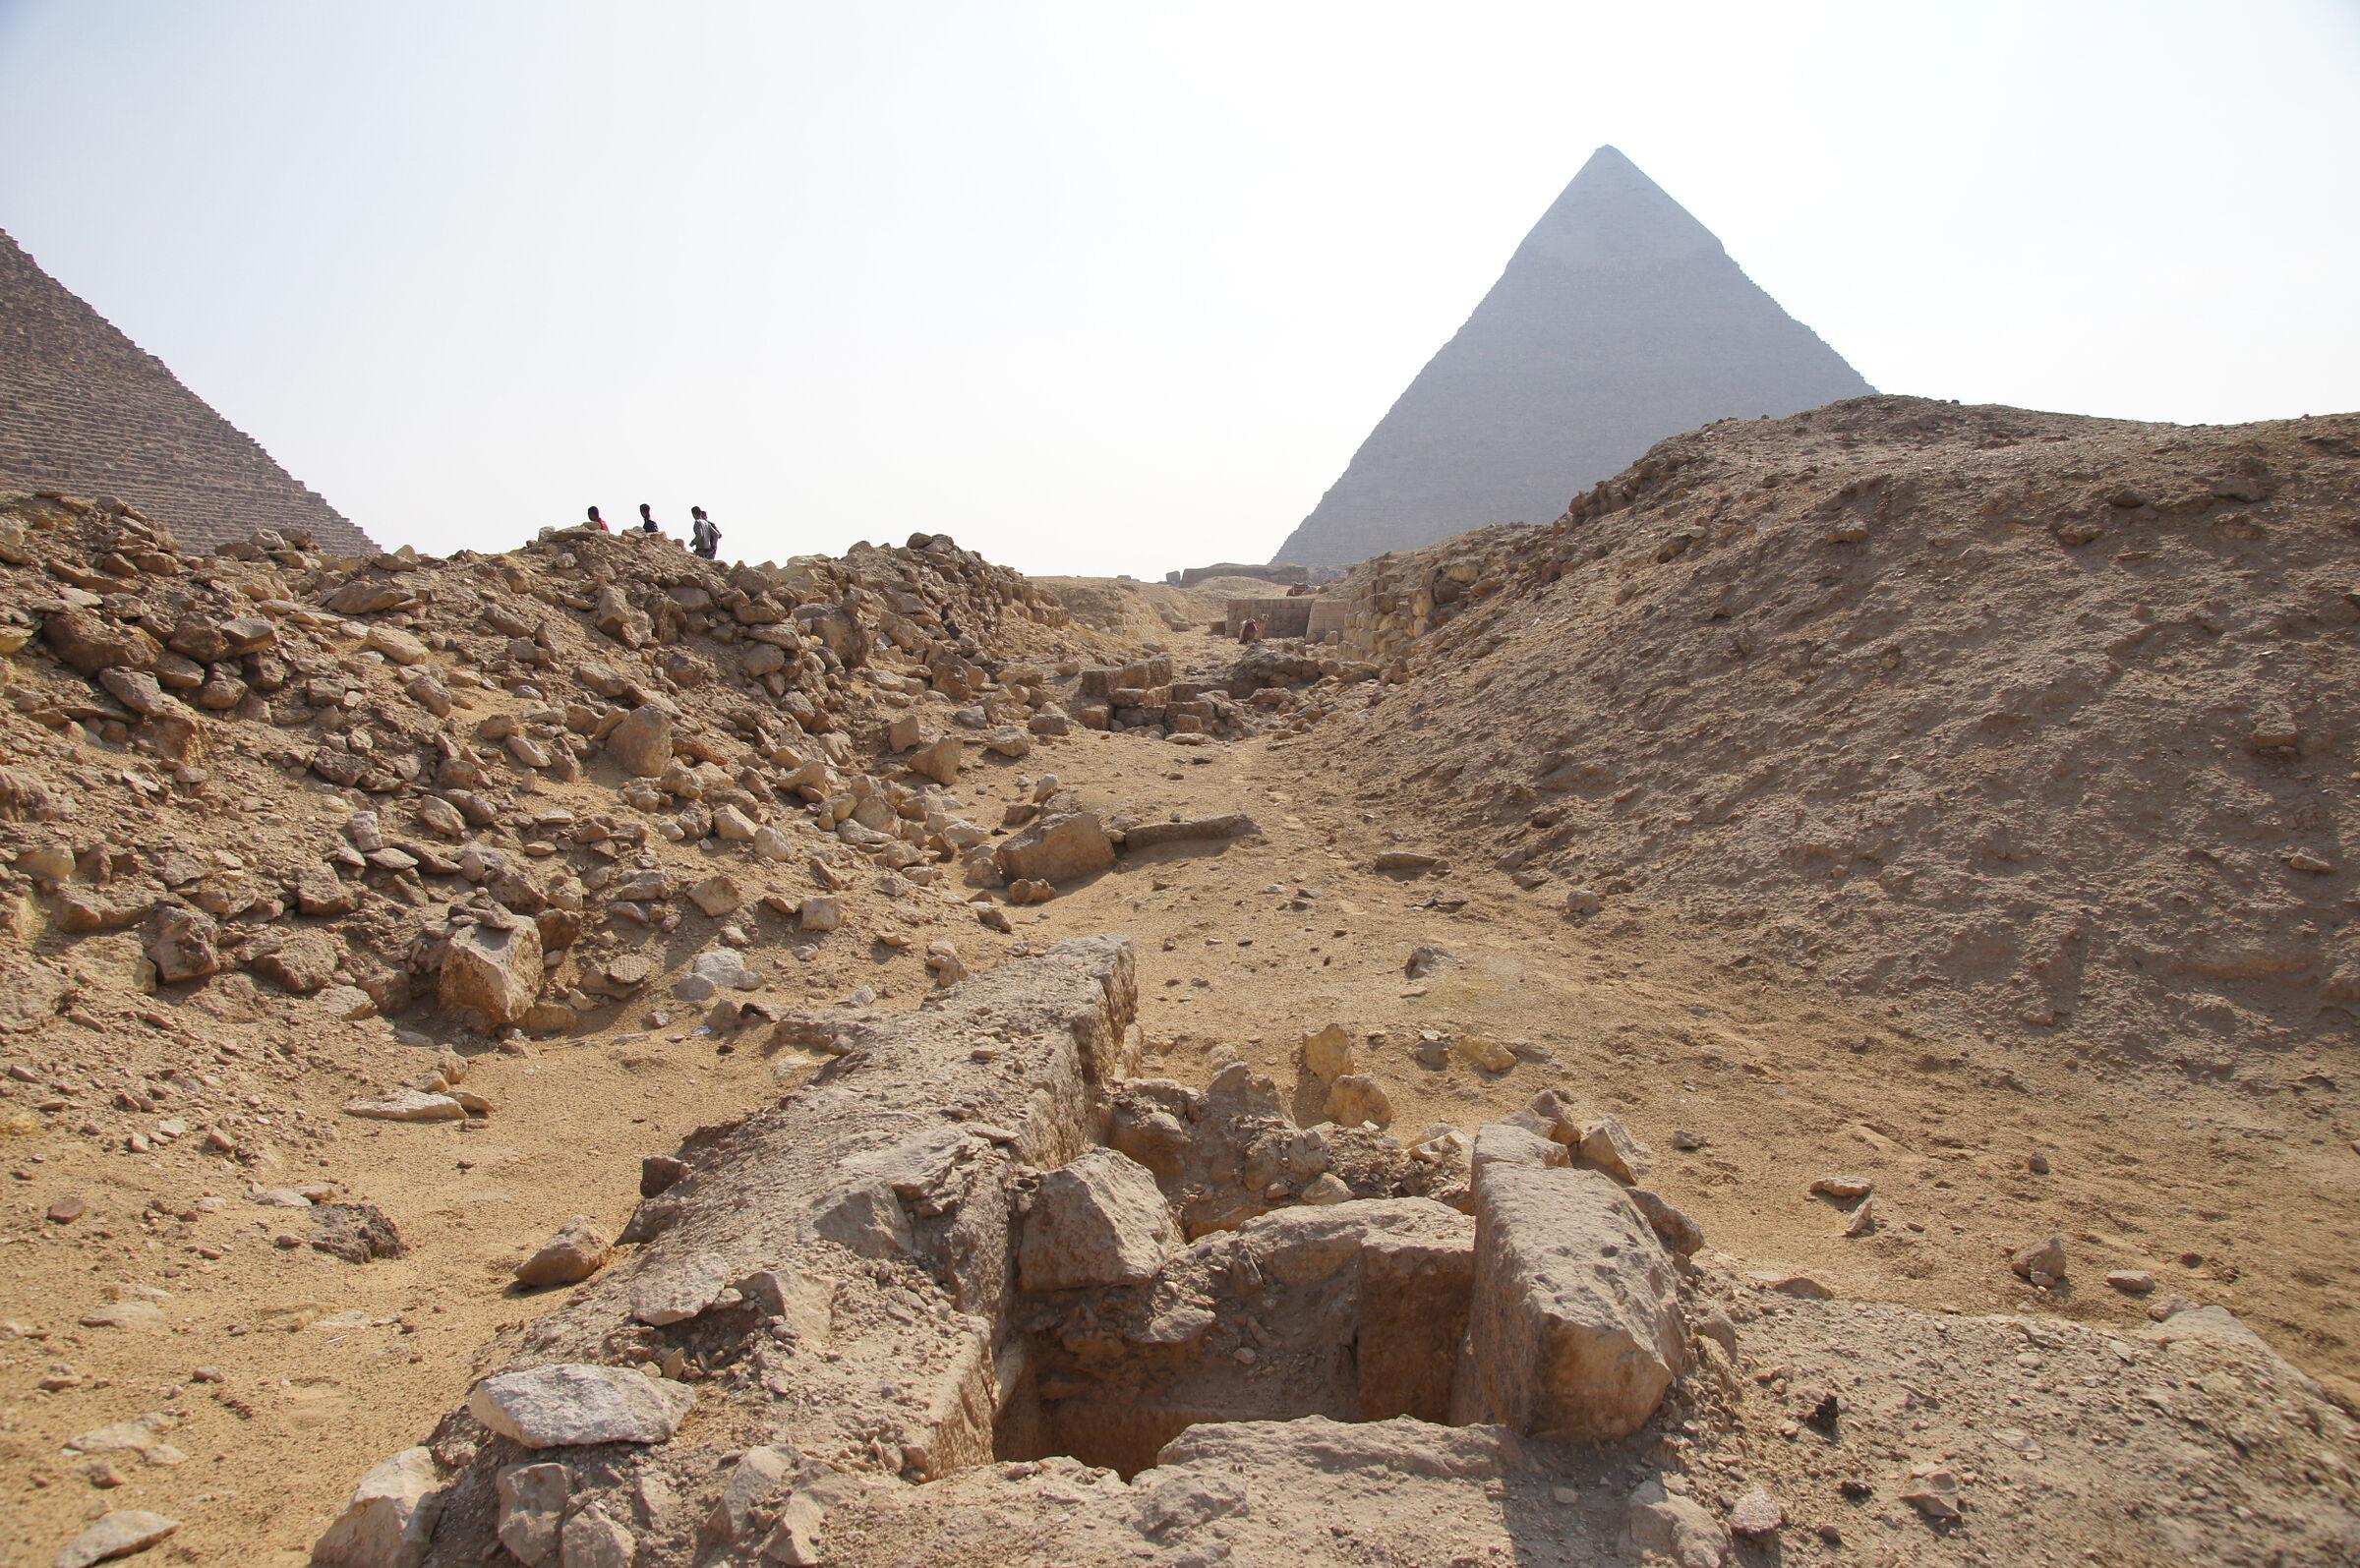 Western Cemetery: Site: Giza; View: G 2170, G 2171, G 2172, G 2173, G 2174, Khafre Pyramid